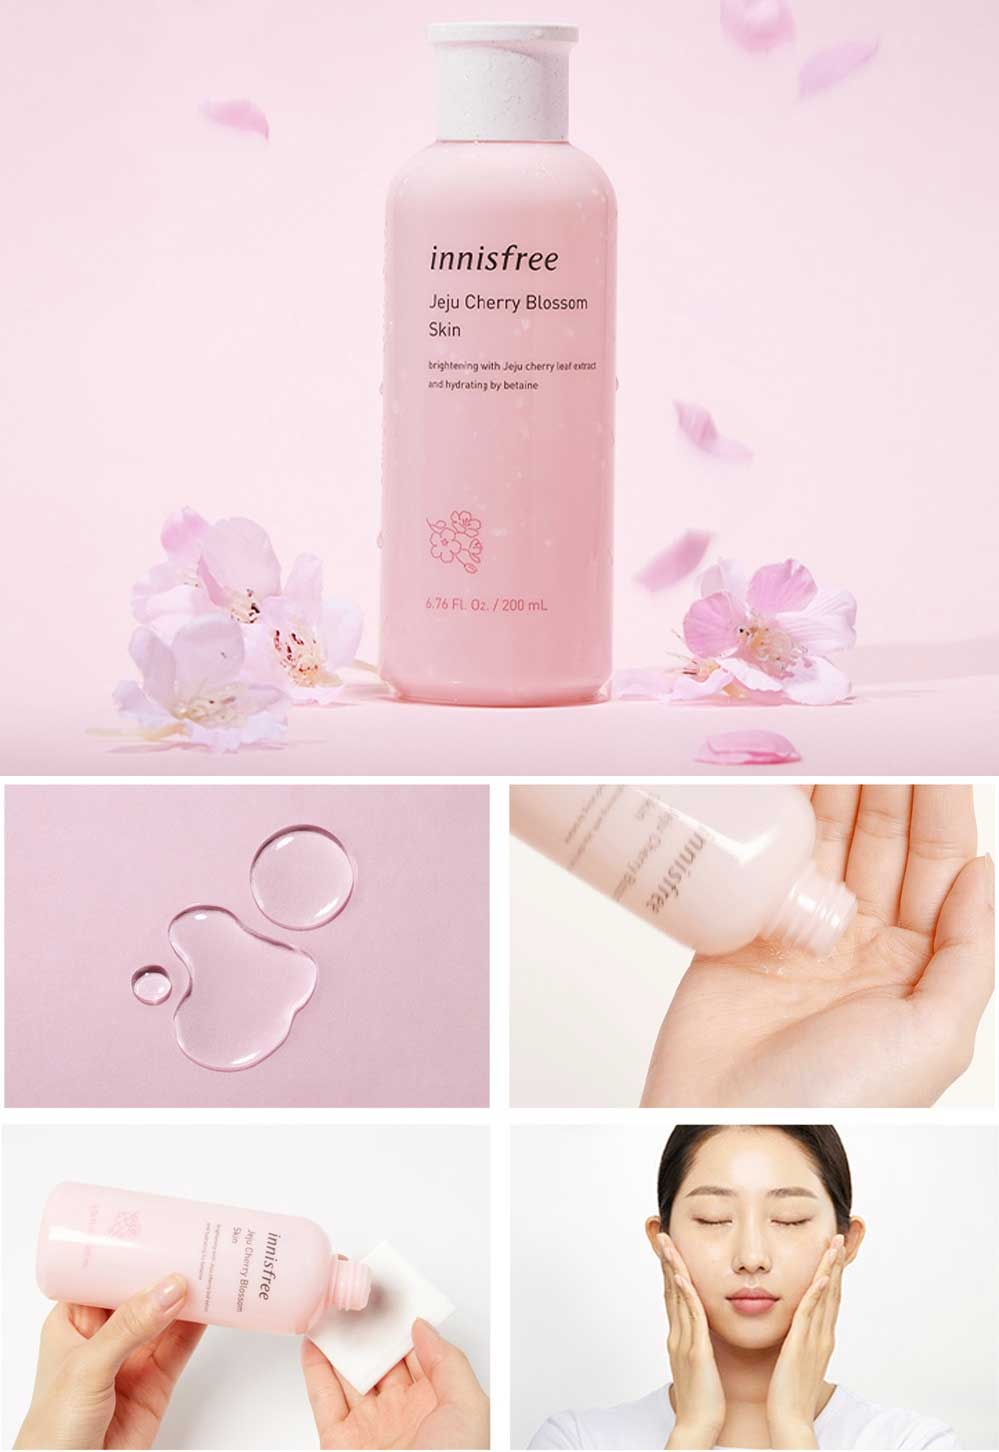 Nước Cân Bằng Innisfree Jeju Cherry Blossom Skin 200ml